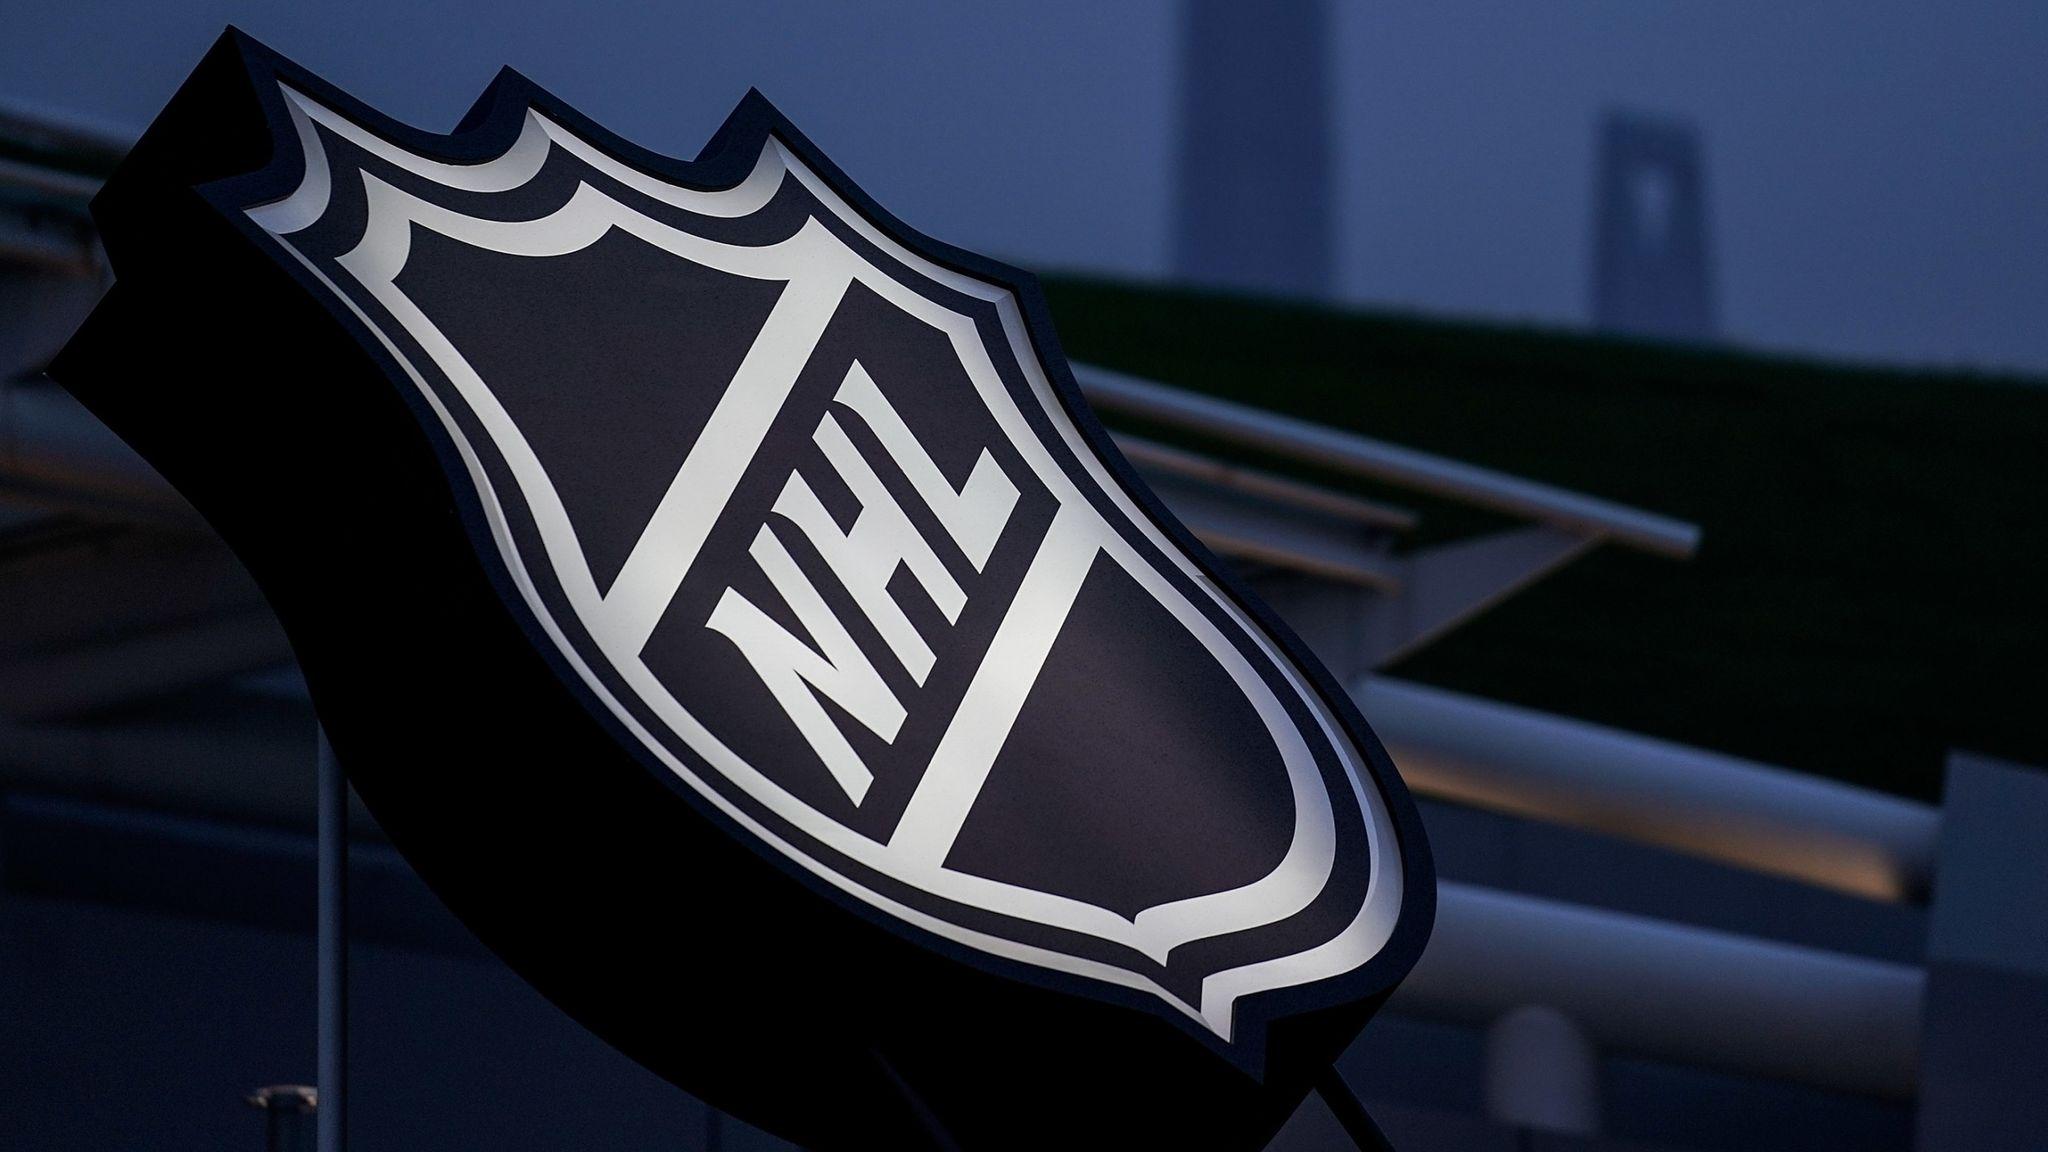 https://e0.365dm.com/20/05/2048x1152/skysports-nhl-ice-hockey_4999575.jpg